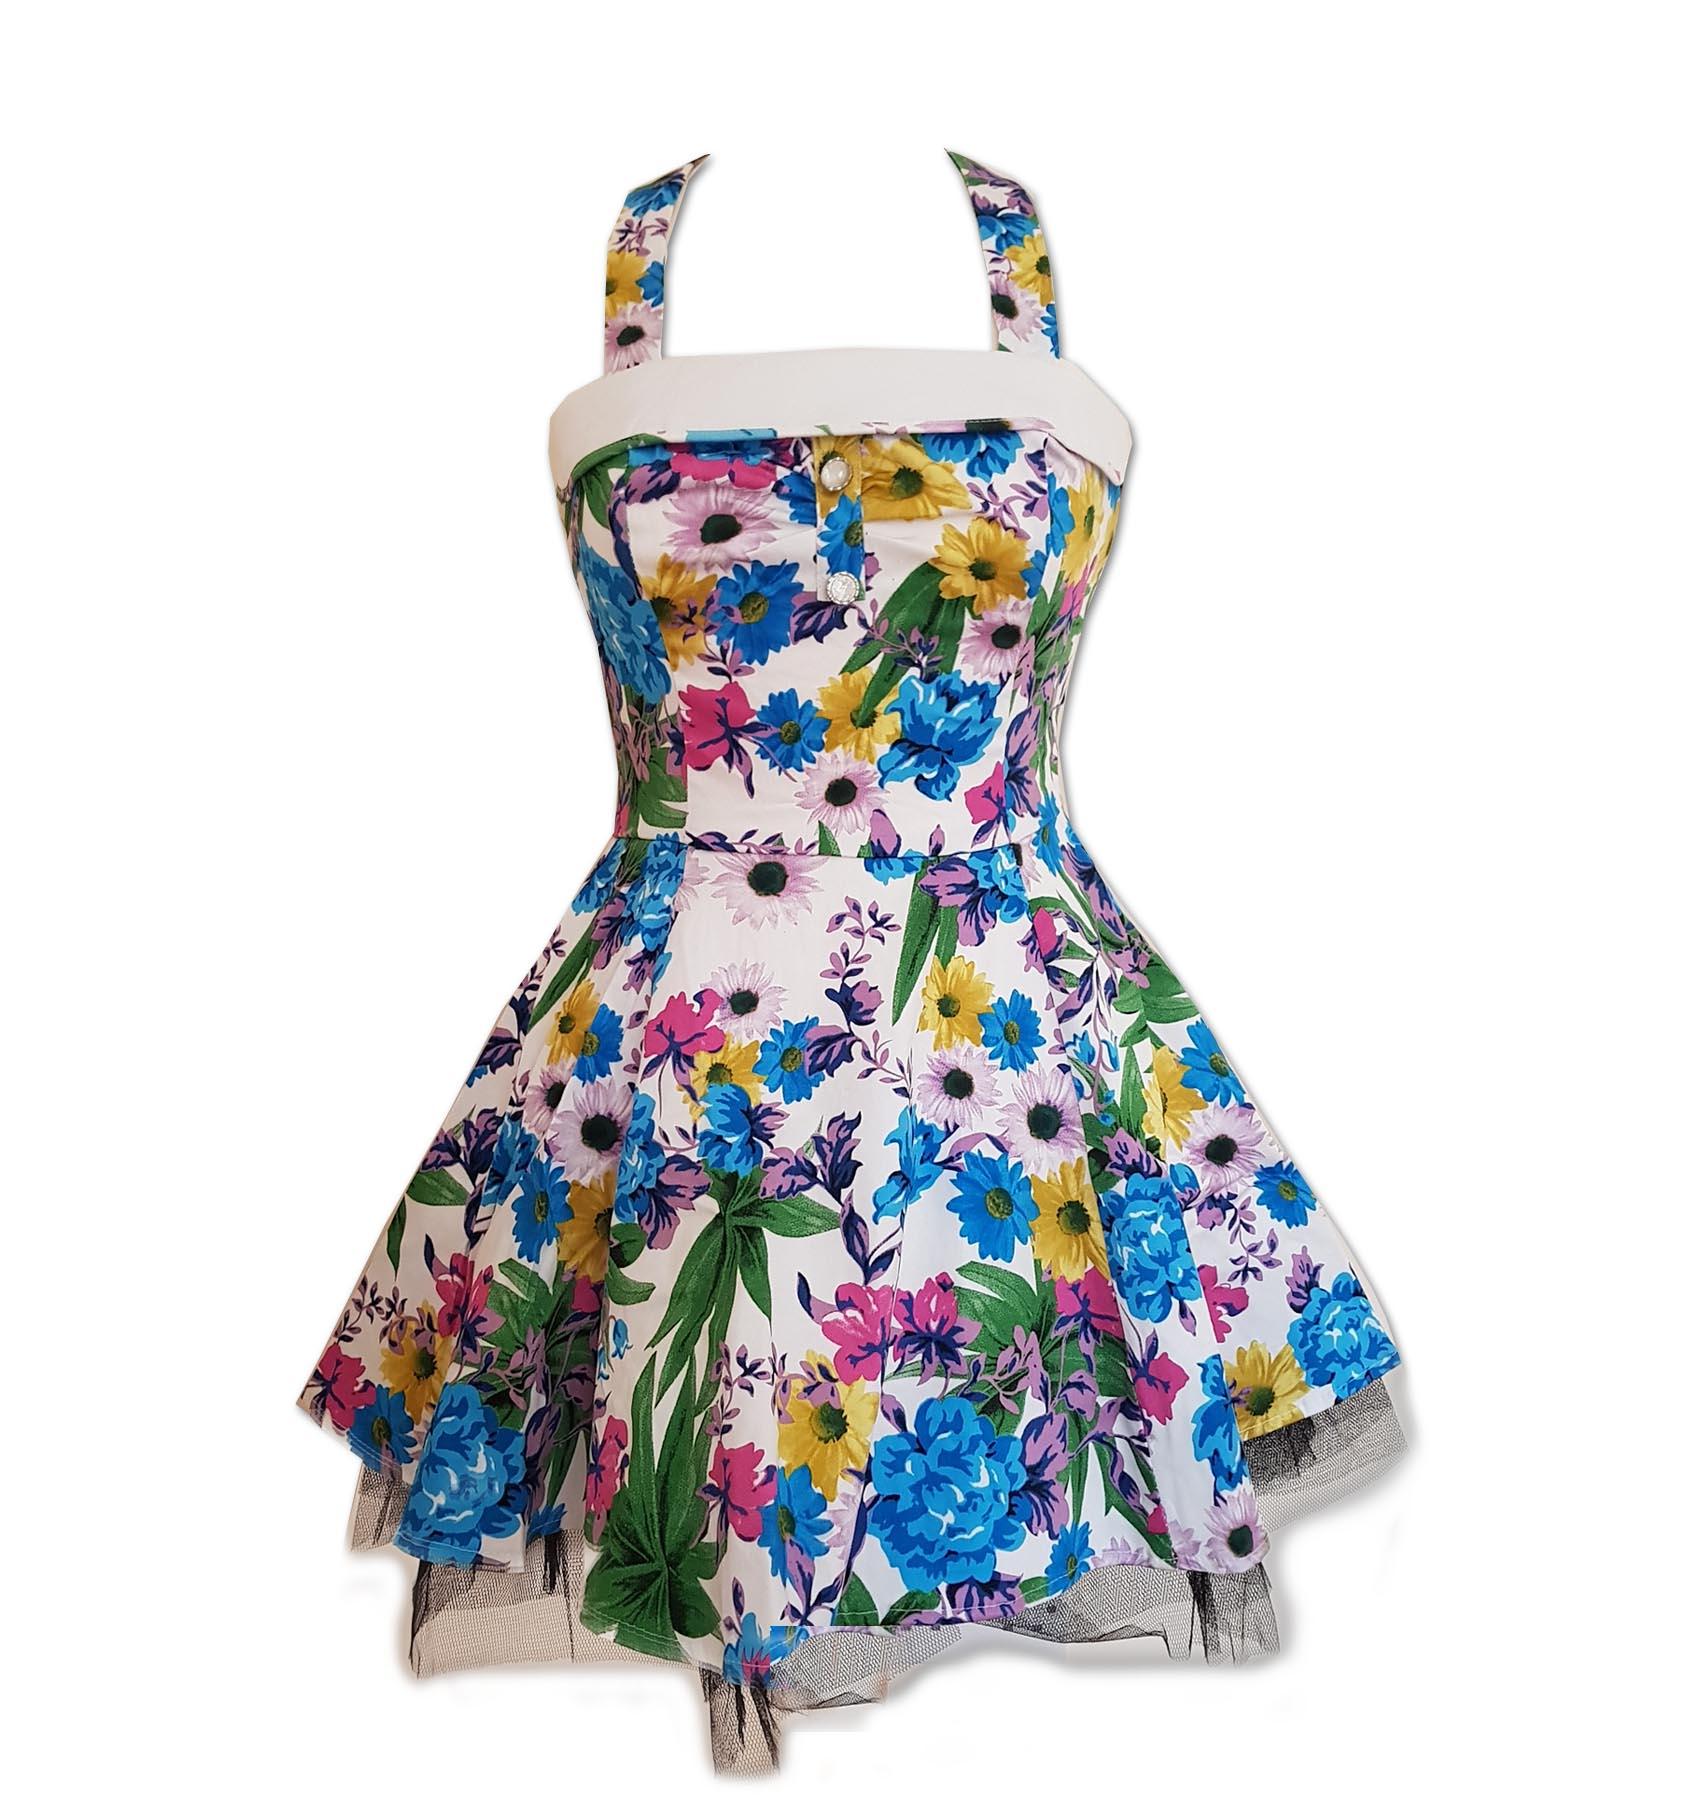 H-amp-R-Hearts-amp-Roses-London-White-Mini-Dress-039-Summer-Day-039-Flowers-All-Sizes thumbnail 3